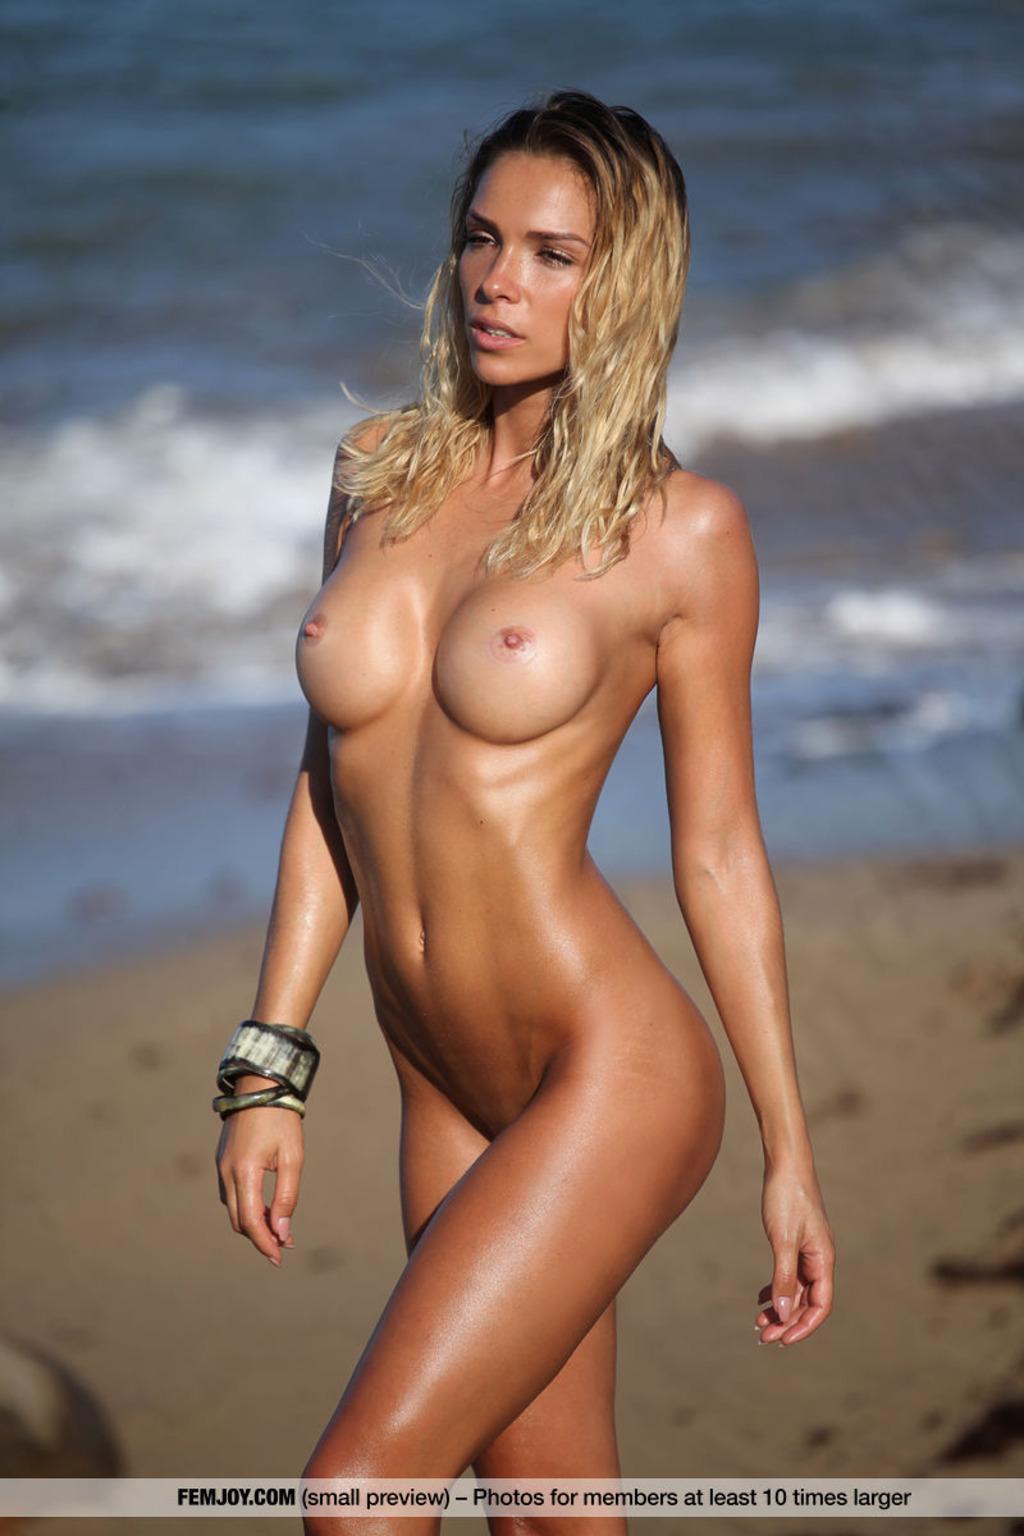 PHOTO | Amber A 00 - Amber A At Secret Beach